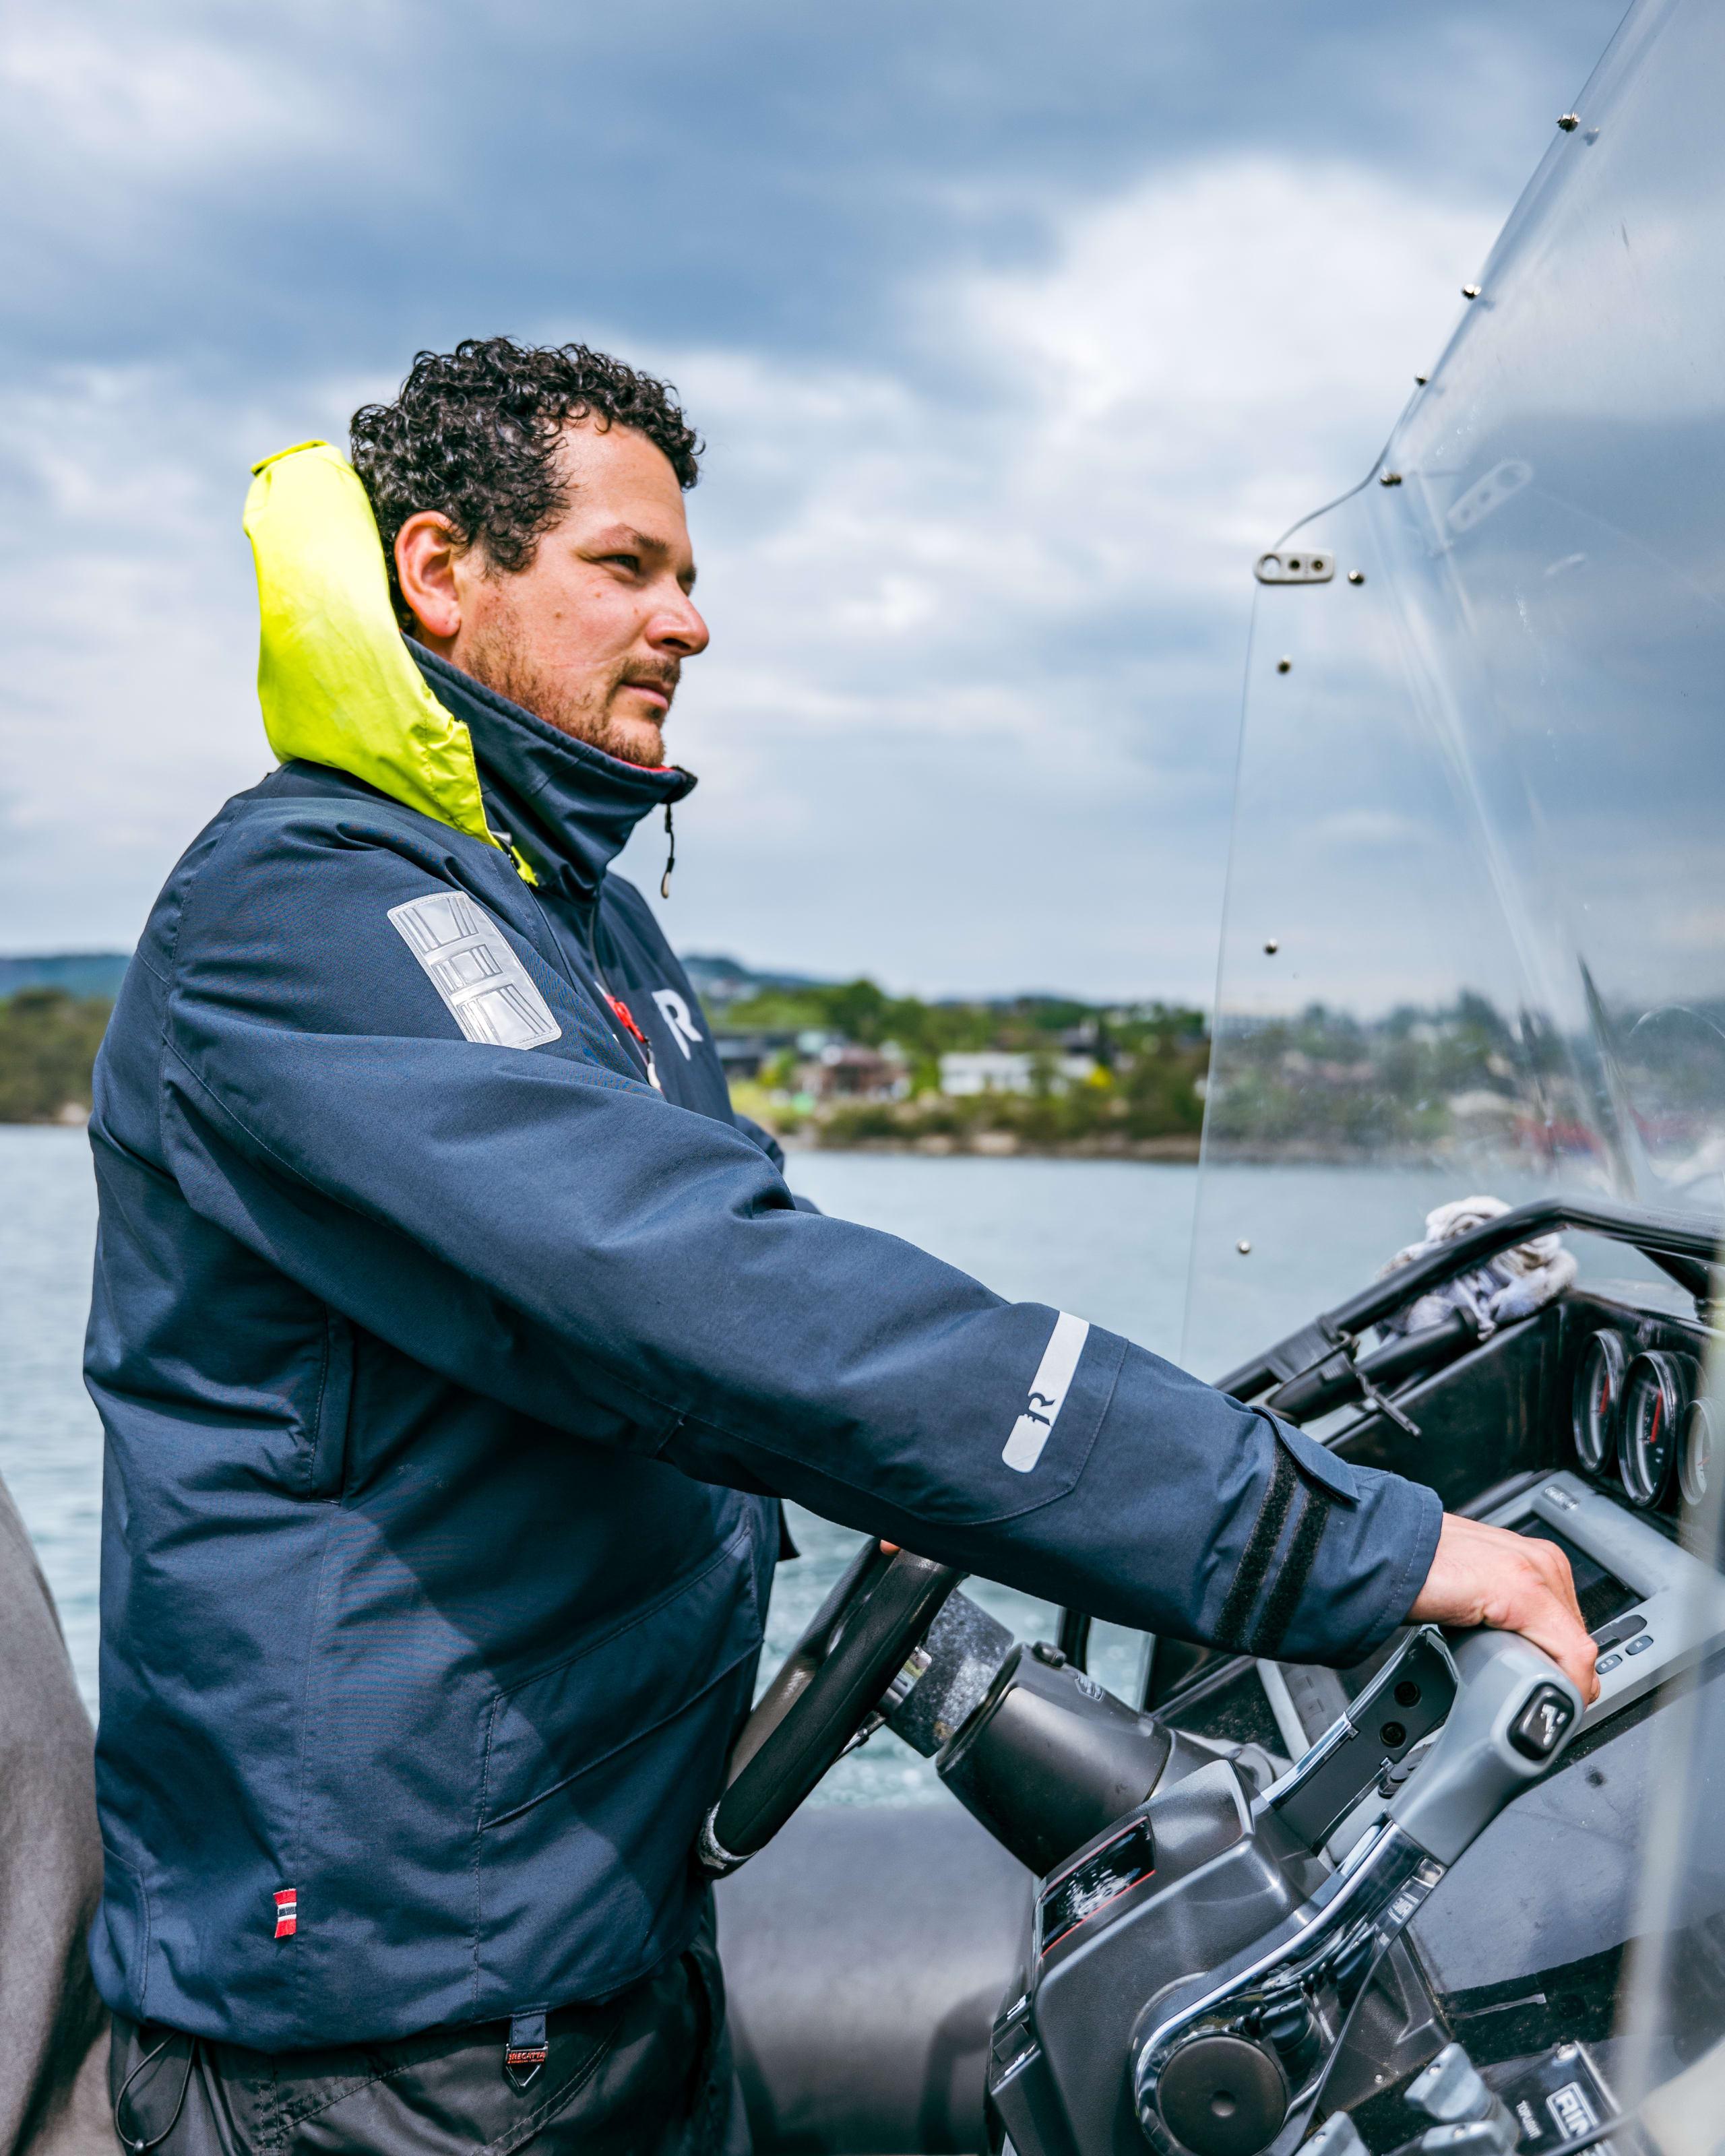 The steady captain of Bergen City RIB